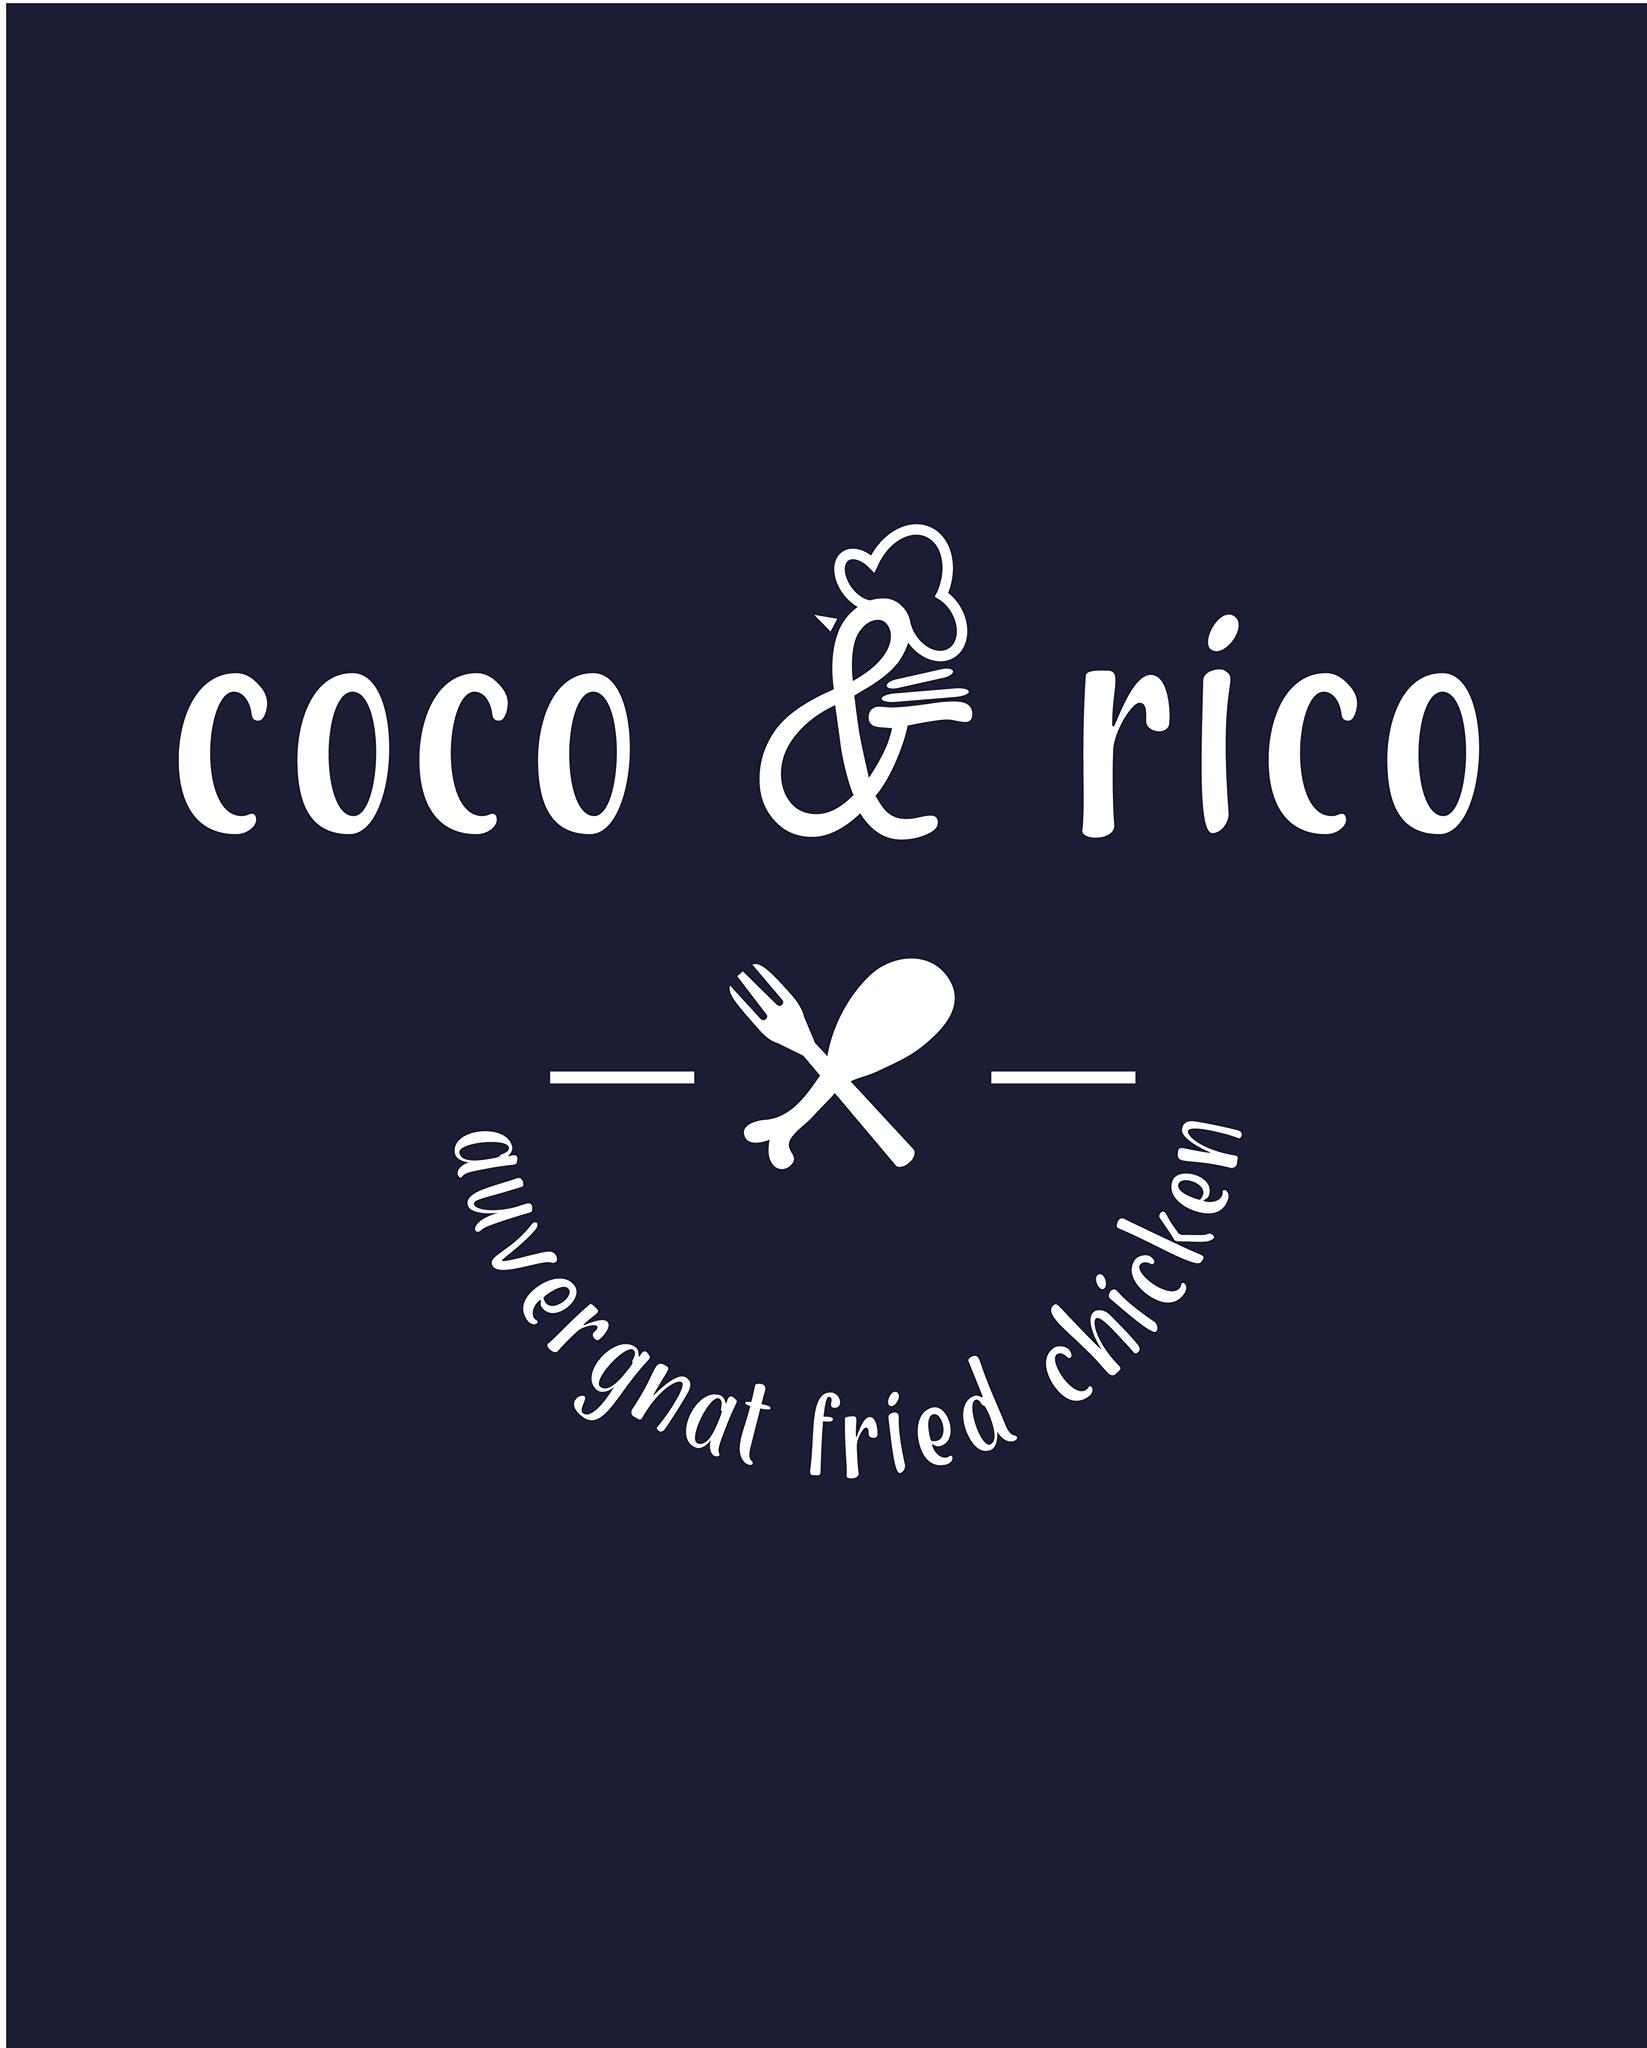 Coco et Rico